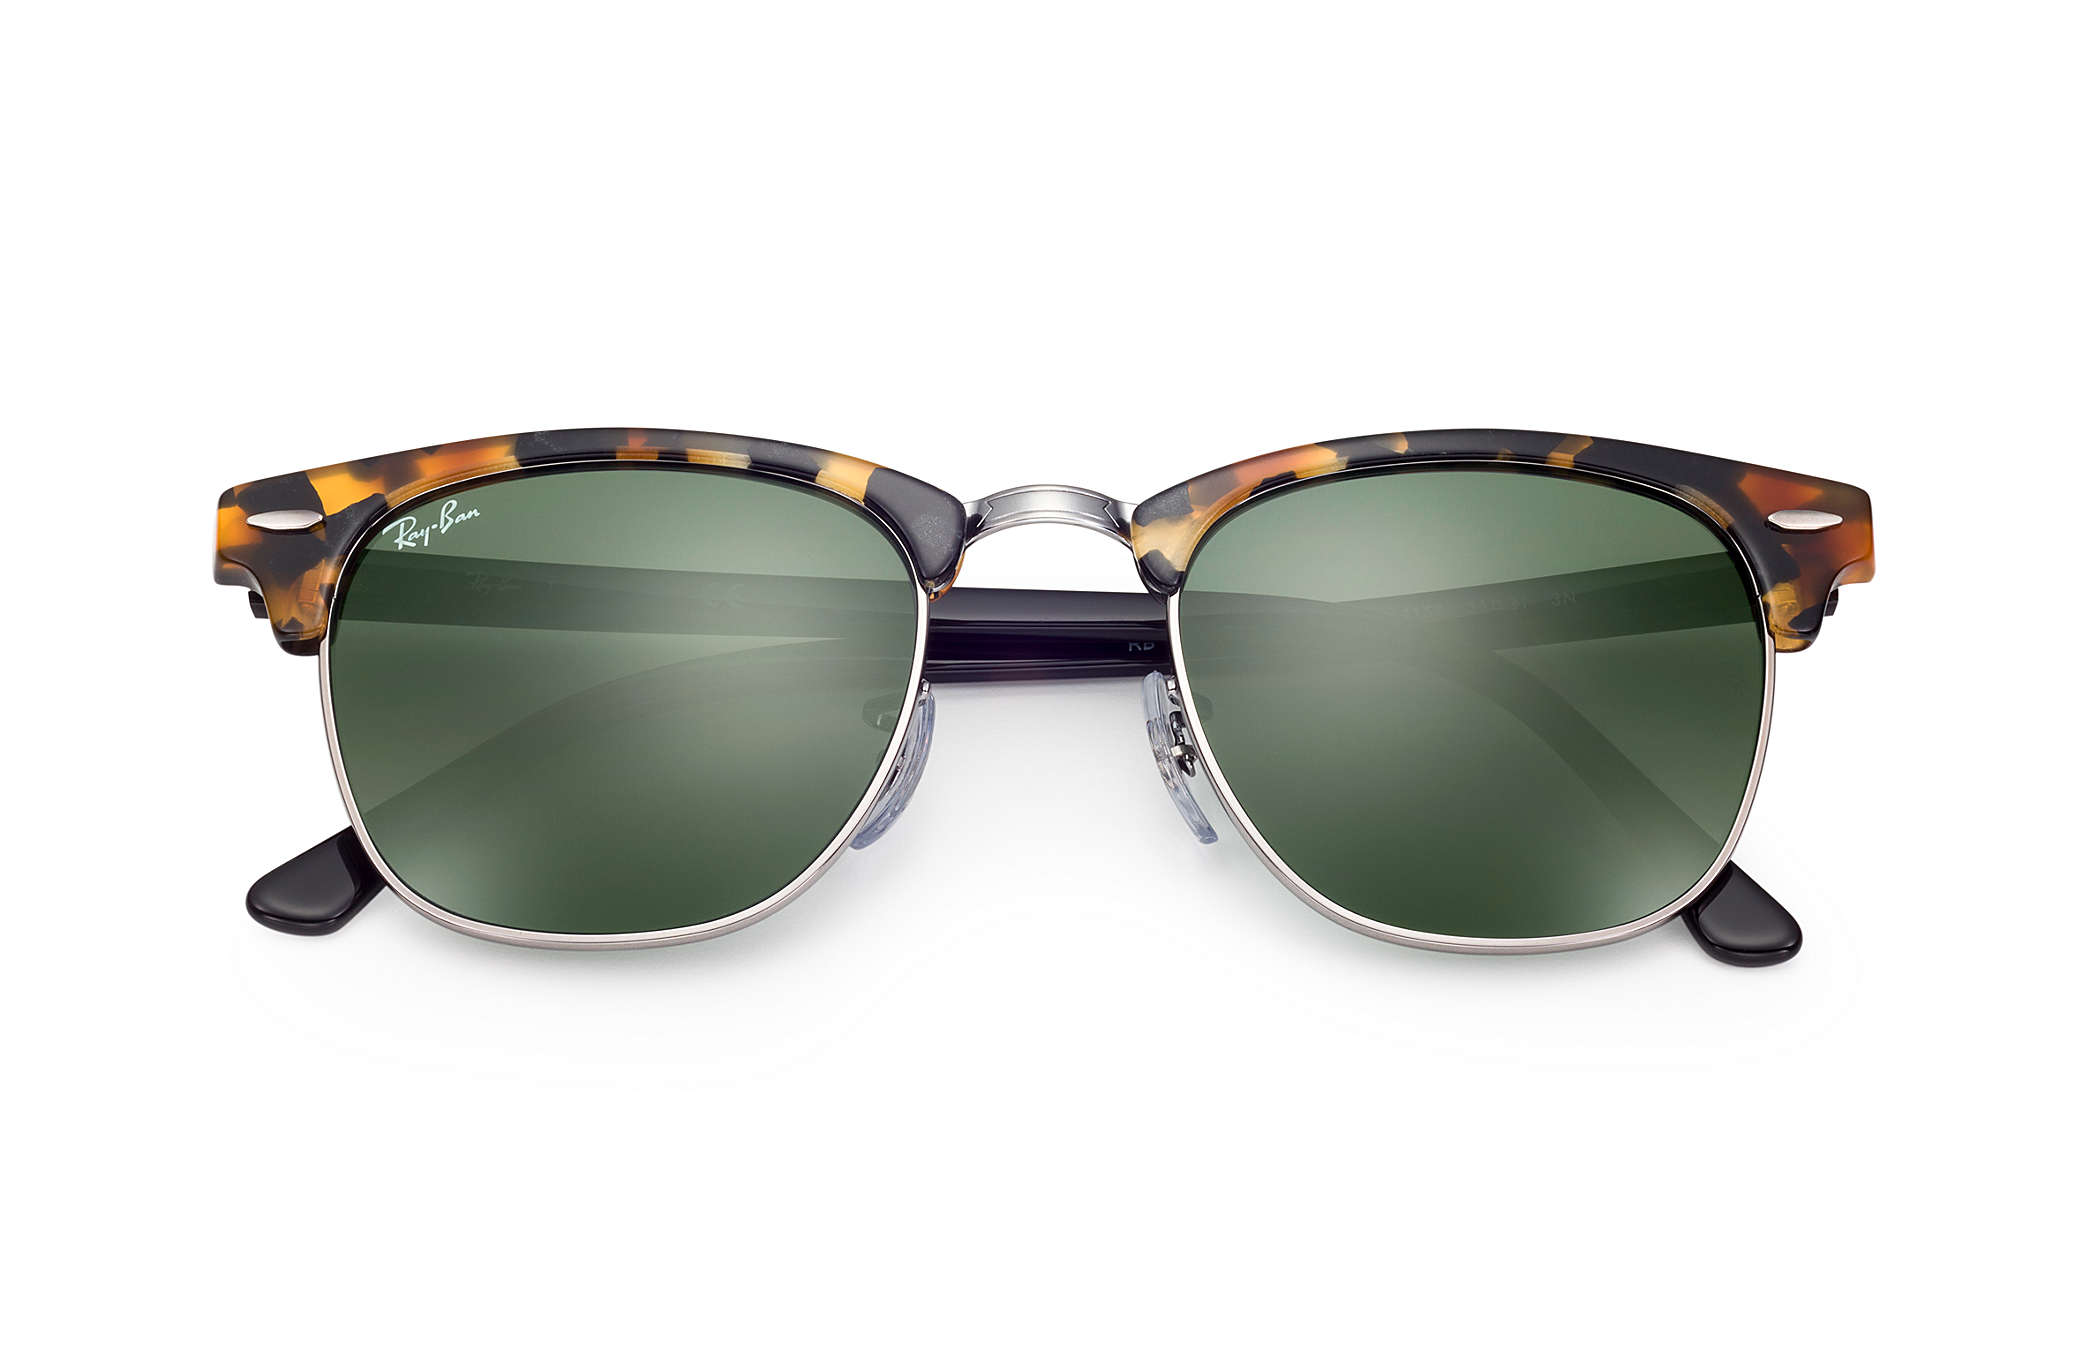 1e55729564 Ray-Ban Clubmaster Fleck RB3016 Tortoise - Acetate - Green Lenses ...